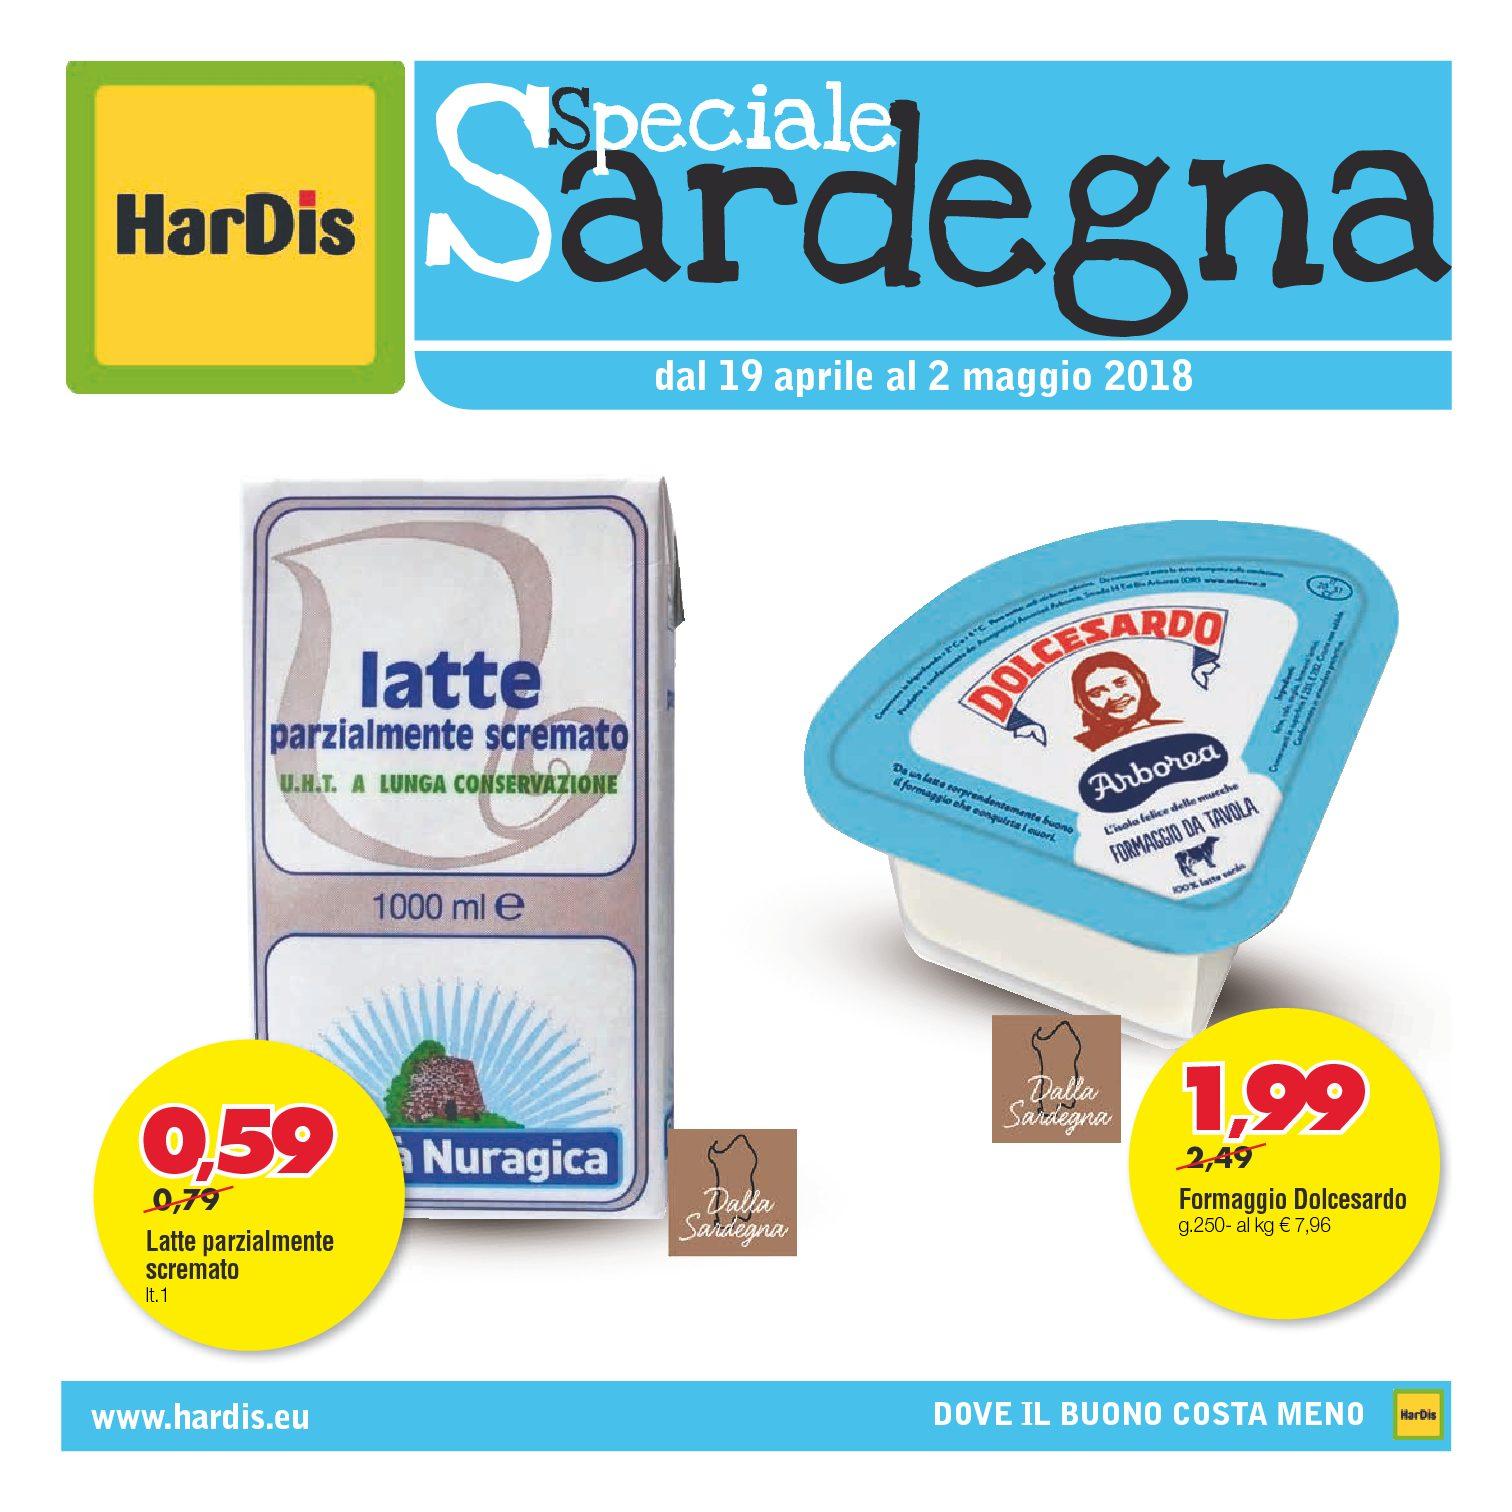 Offerta HarDis – Speciale Sardegna